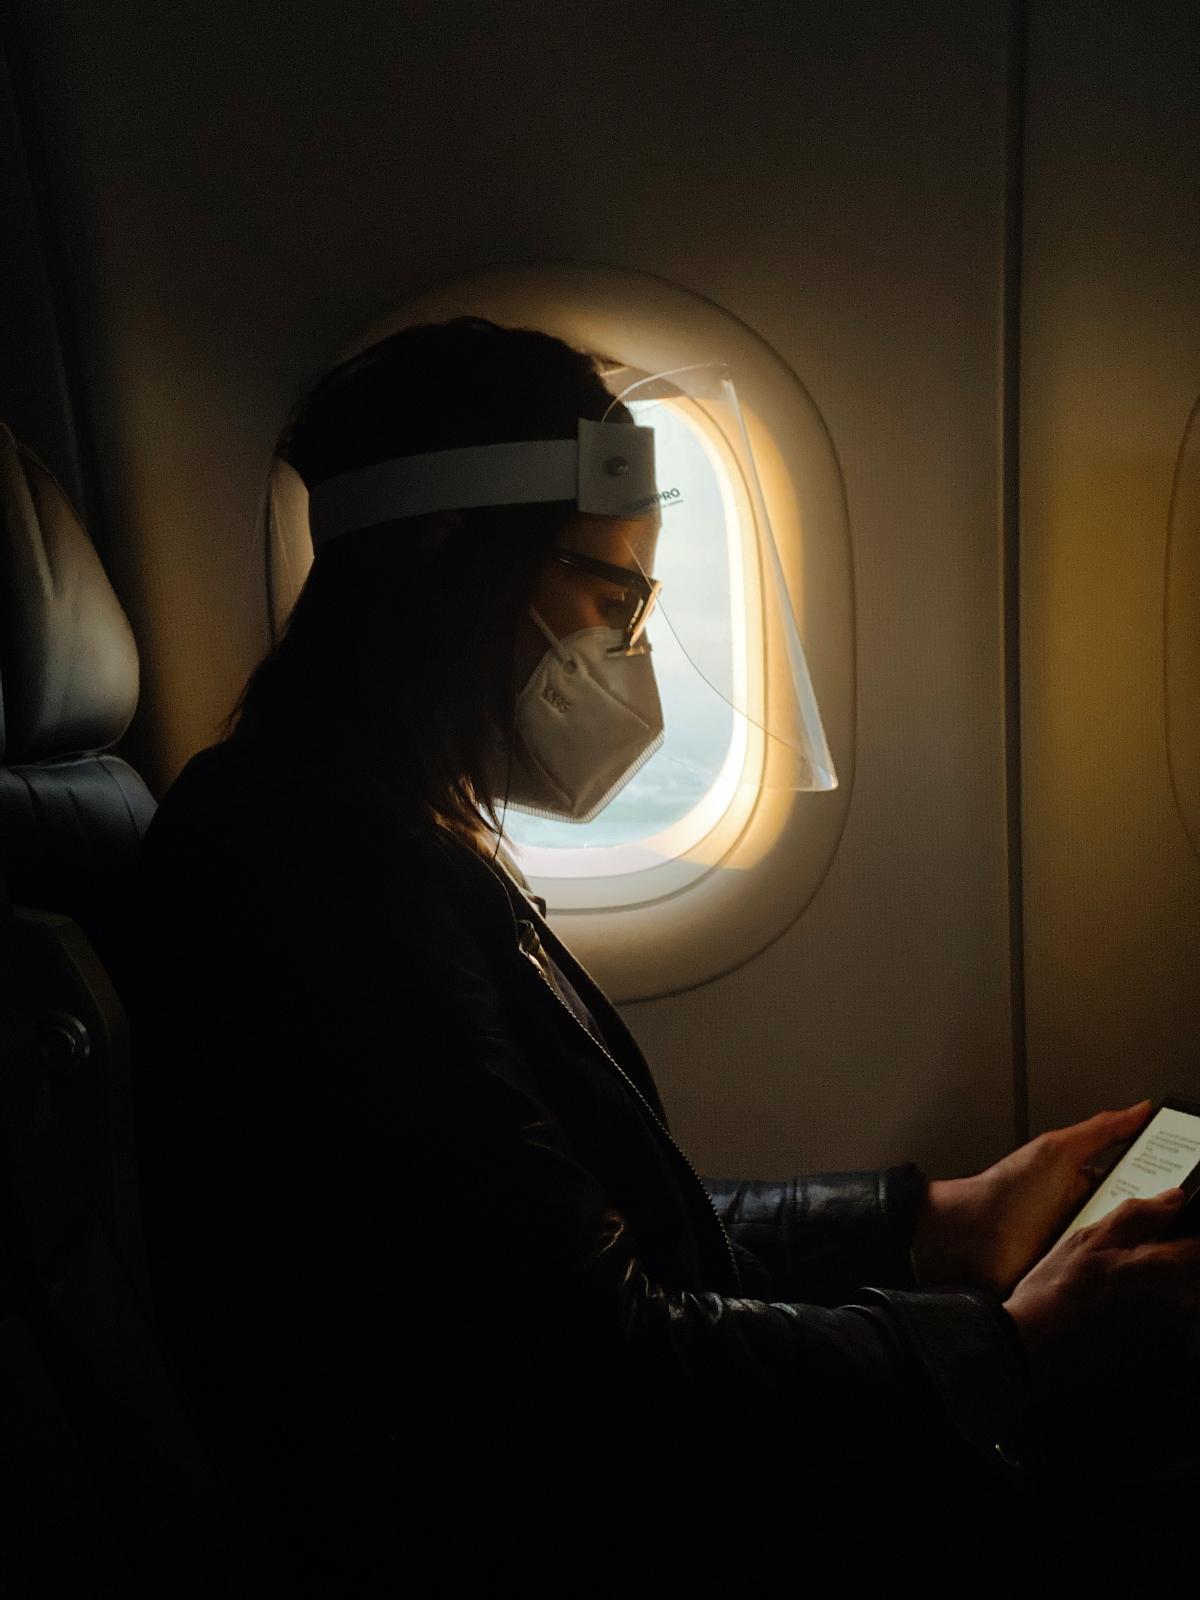 Alberta To Pilot COVID-19 Testing At Border That Would Shorten Quarantine Time